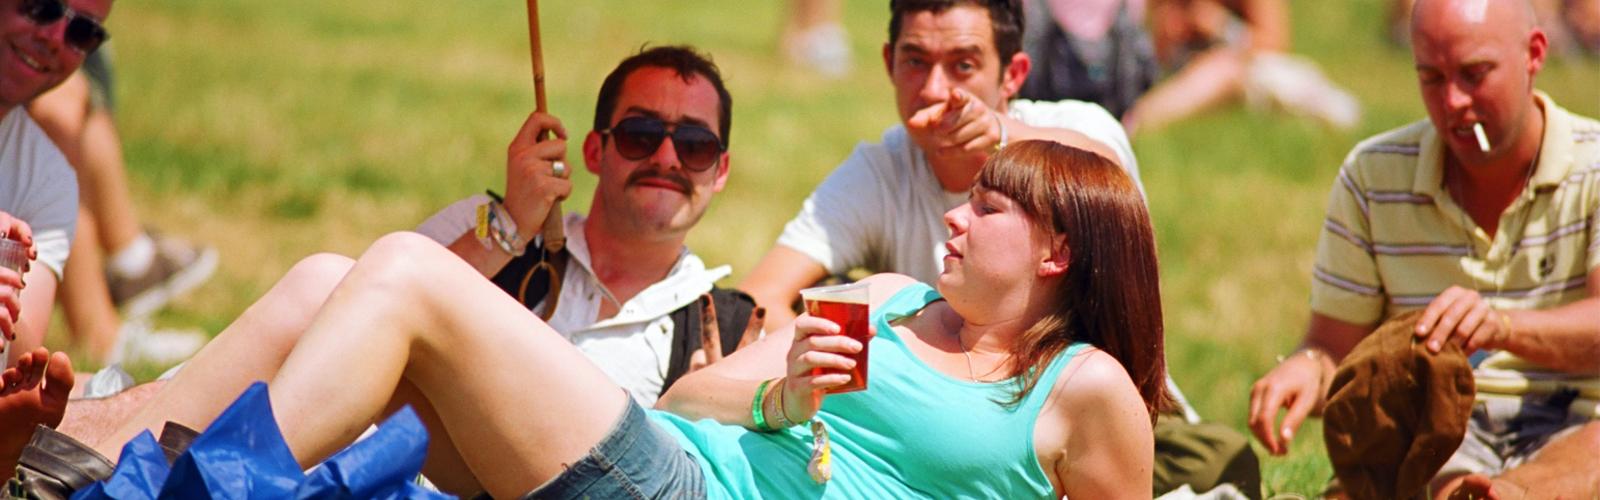 June Festivals Highlights - Part 2